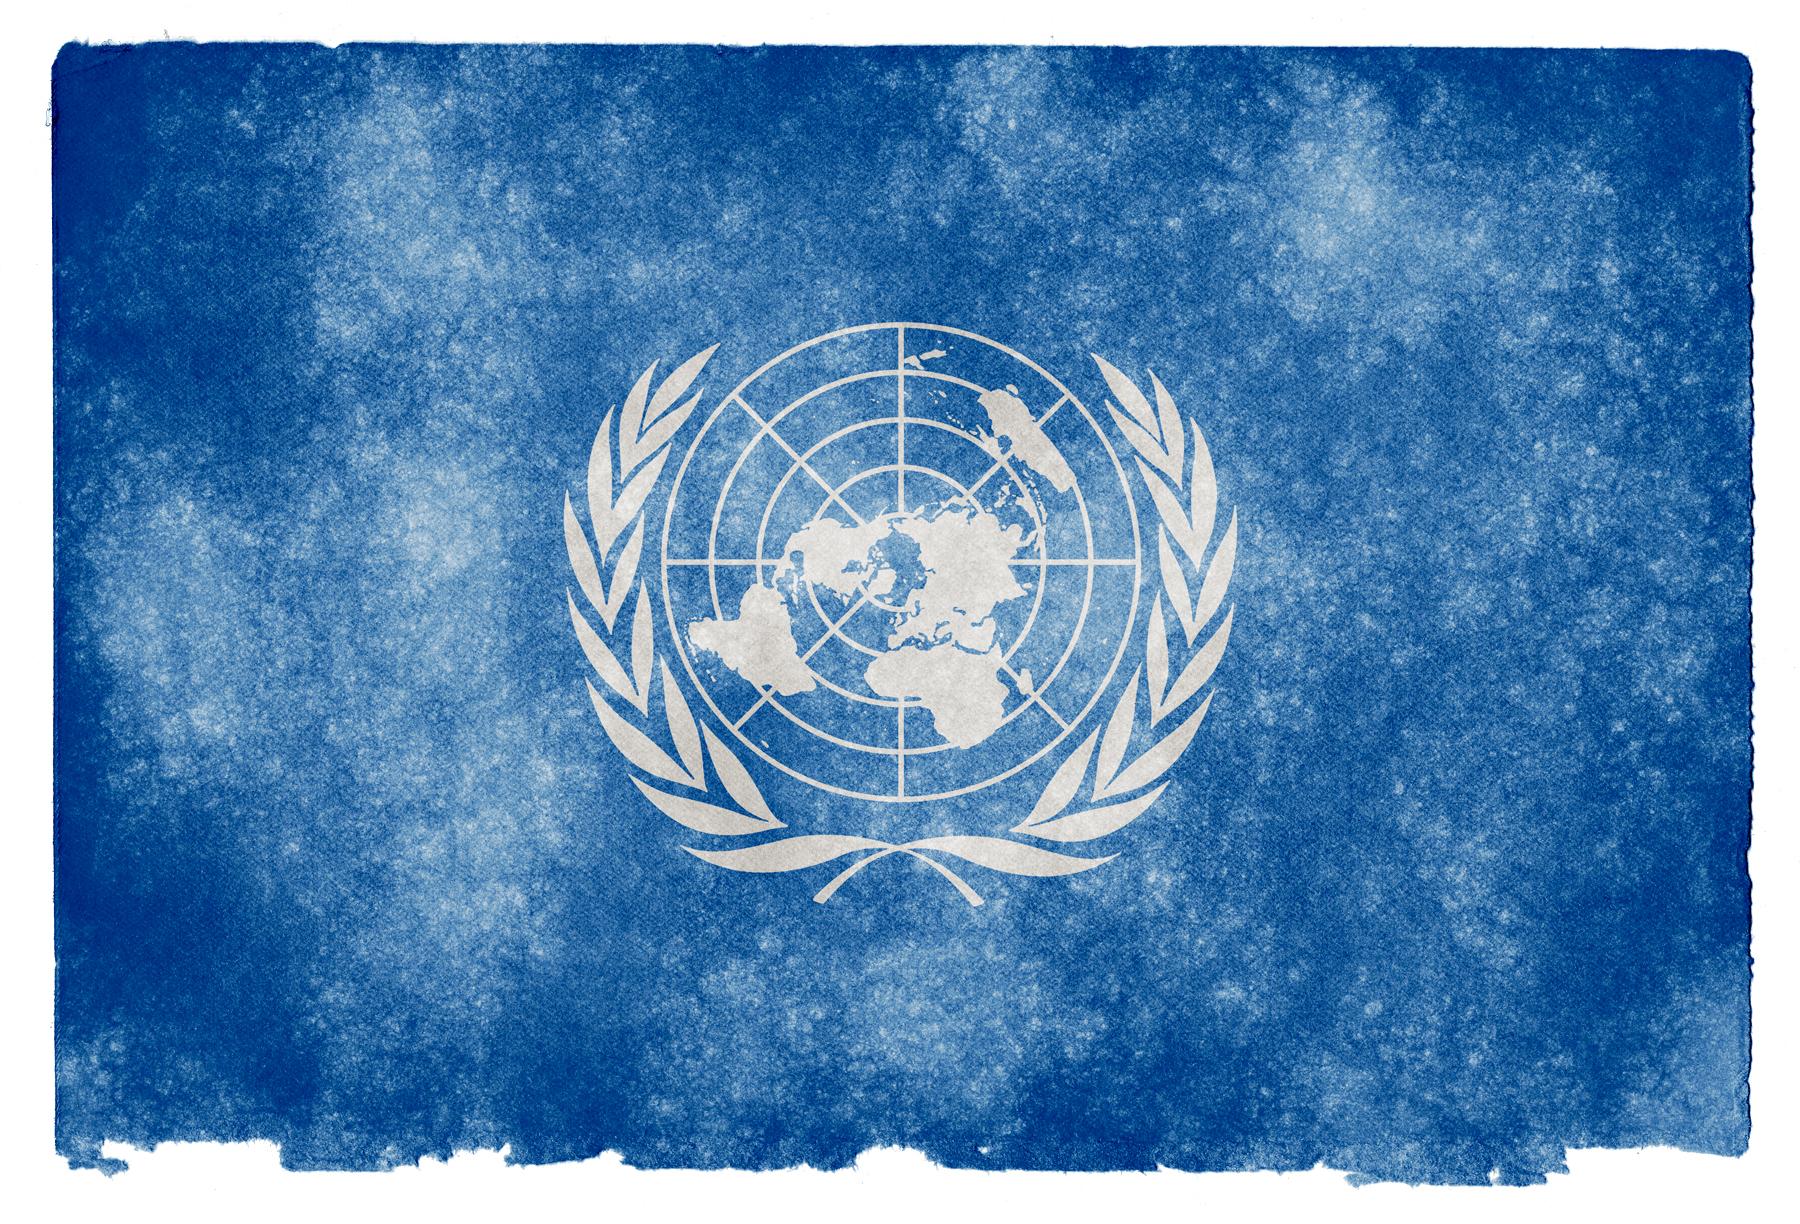 stockvault-united-nations-grunge-flag134749.jpg